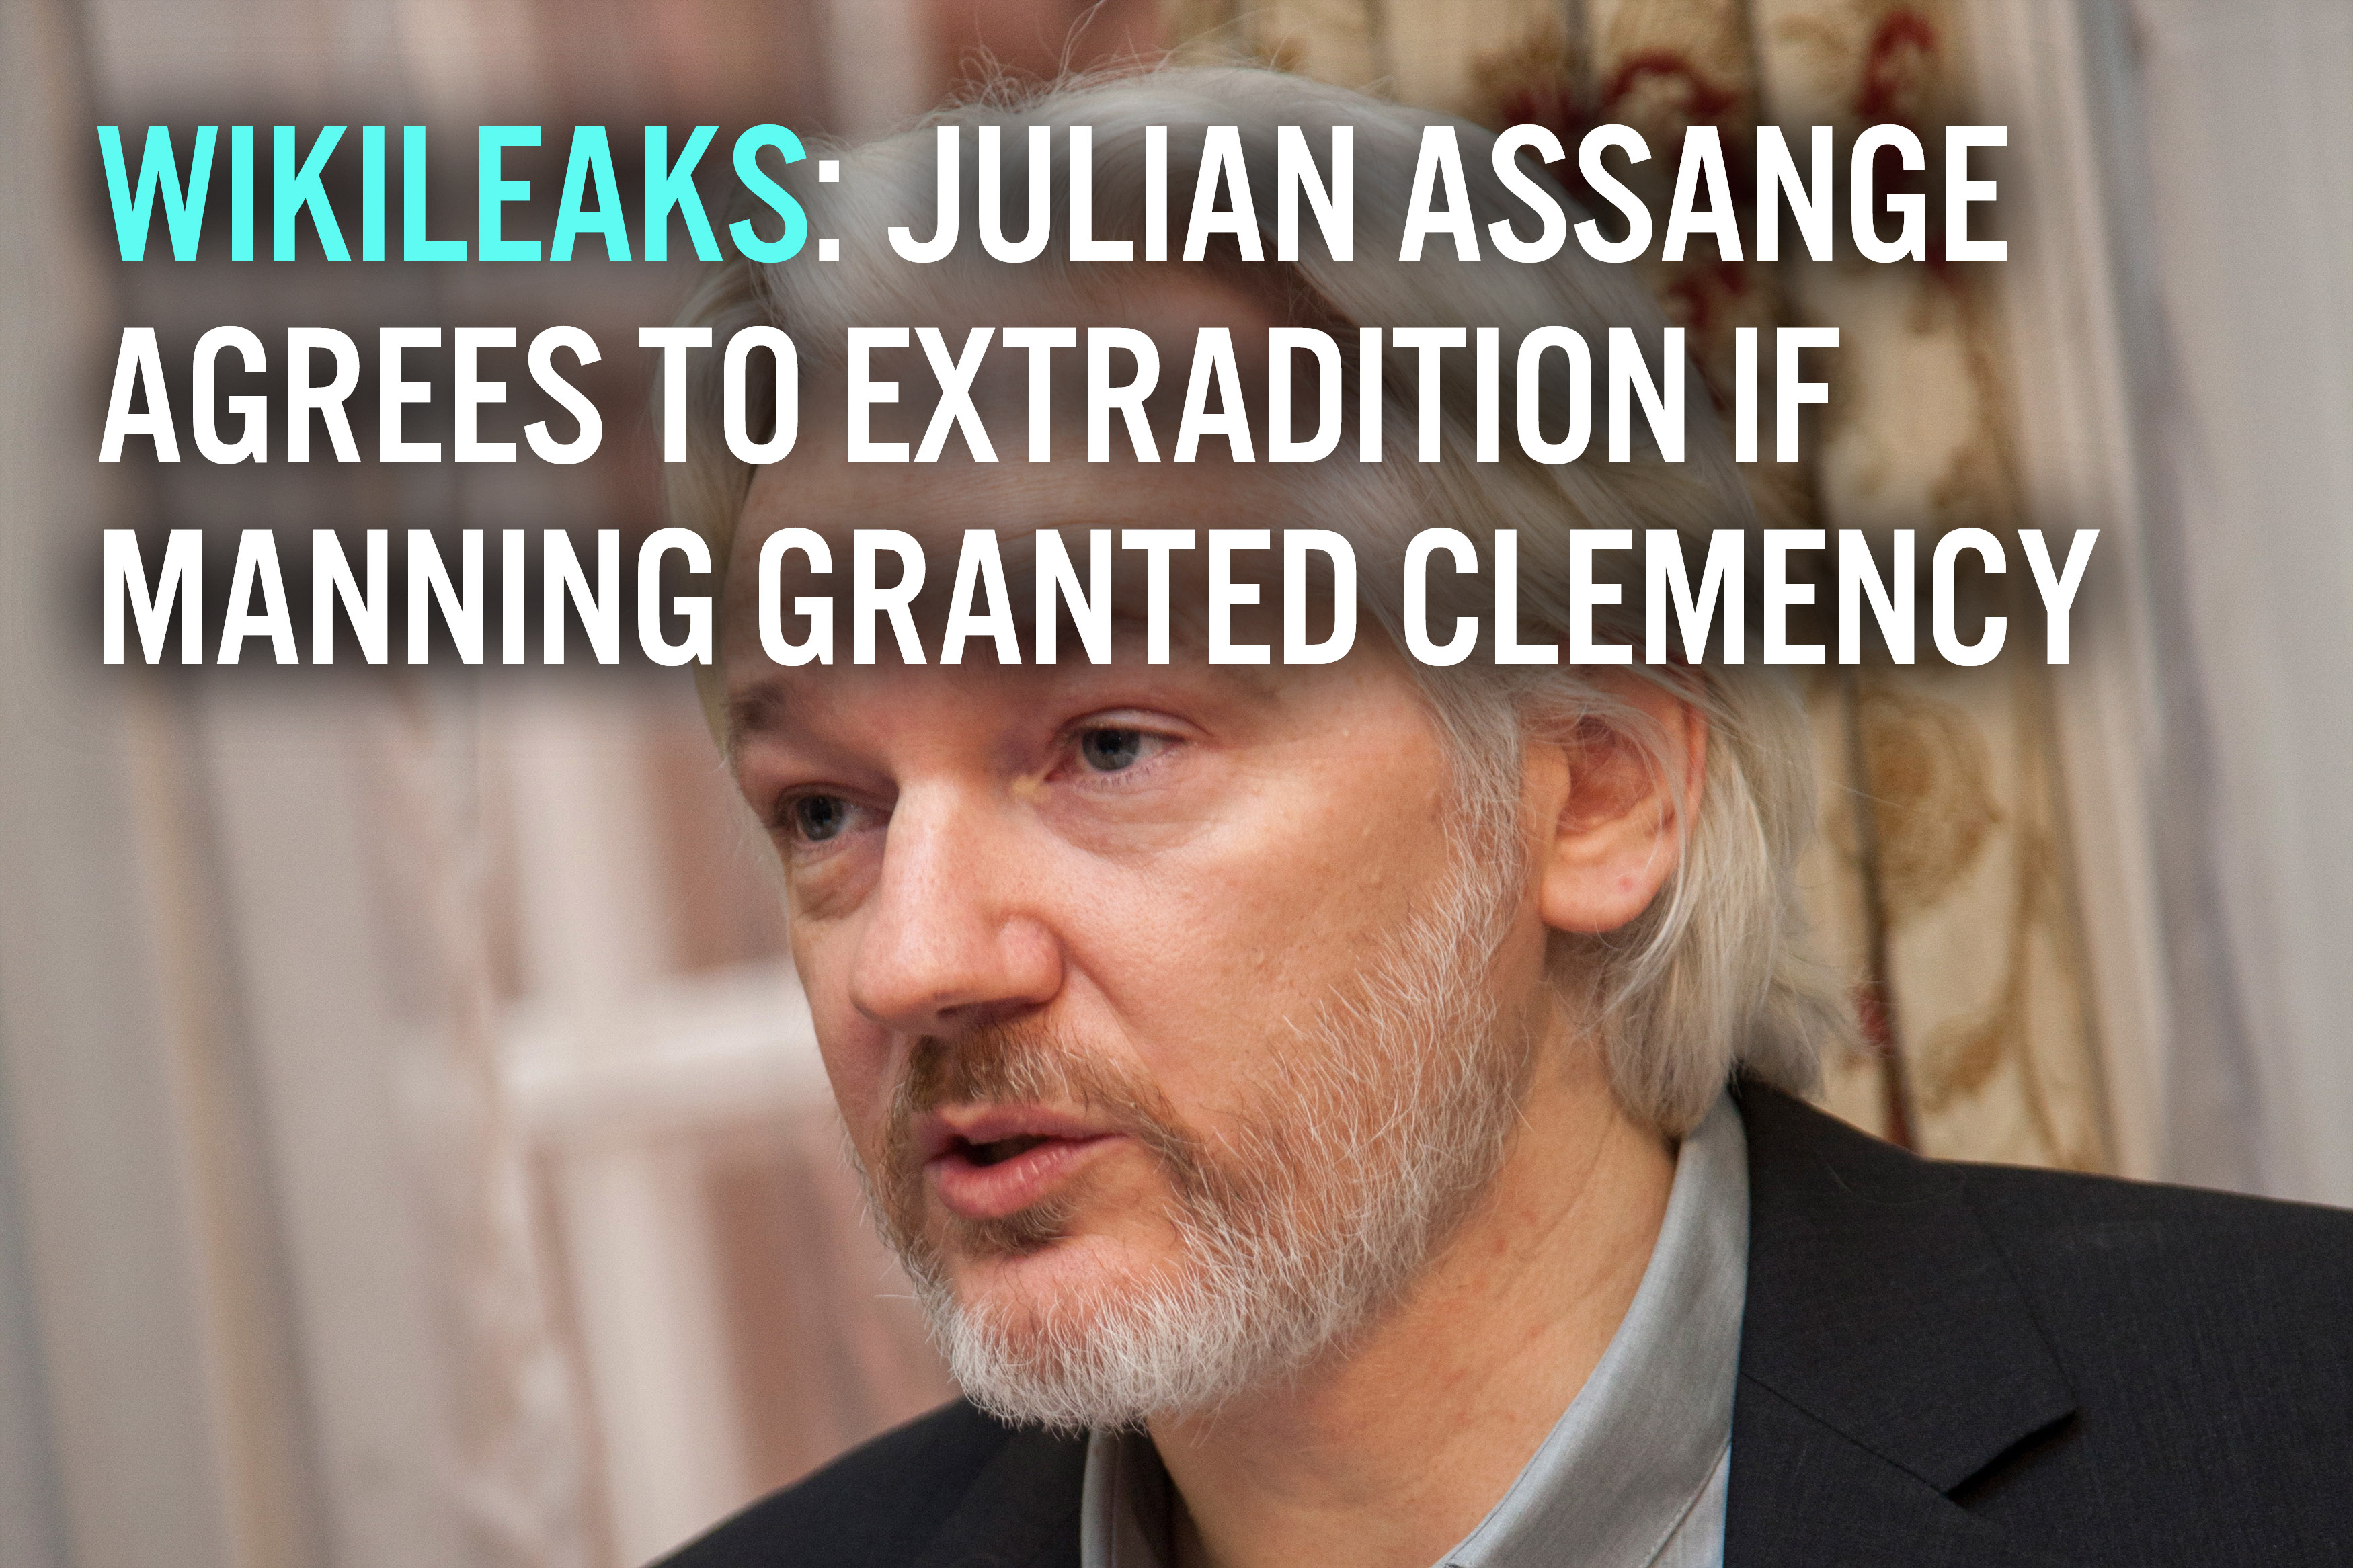 Assange Manning